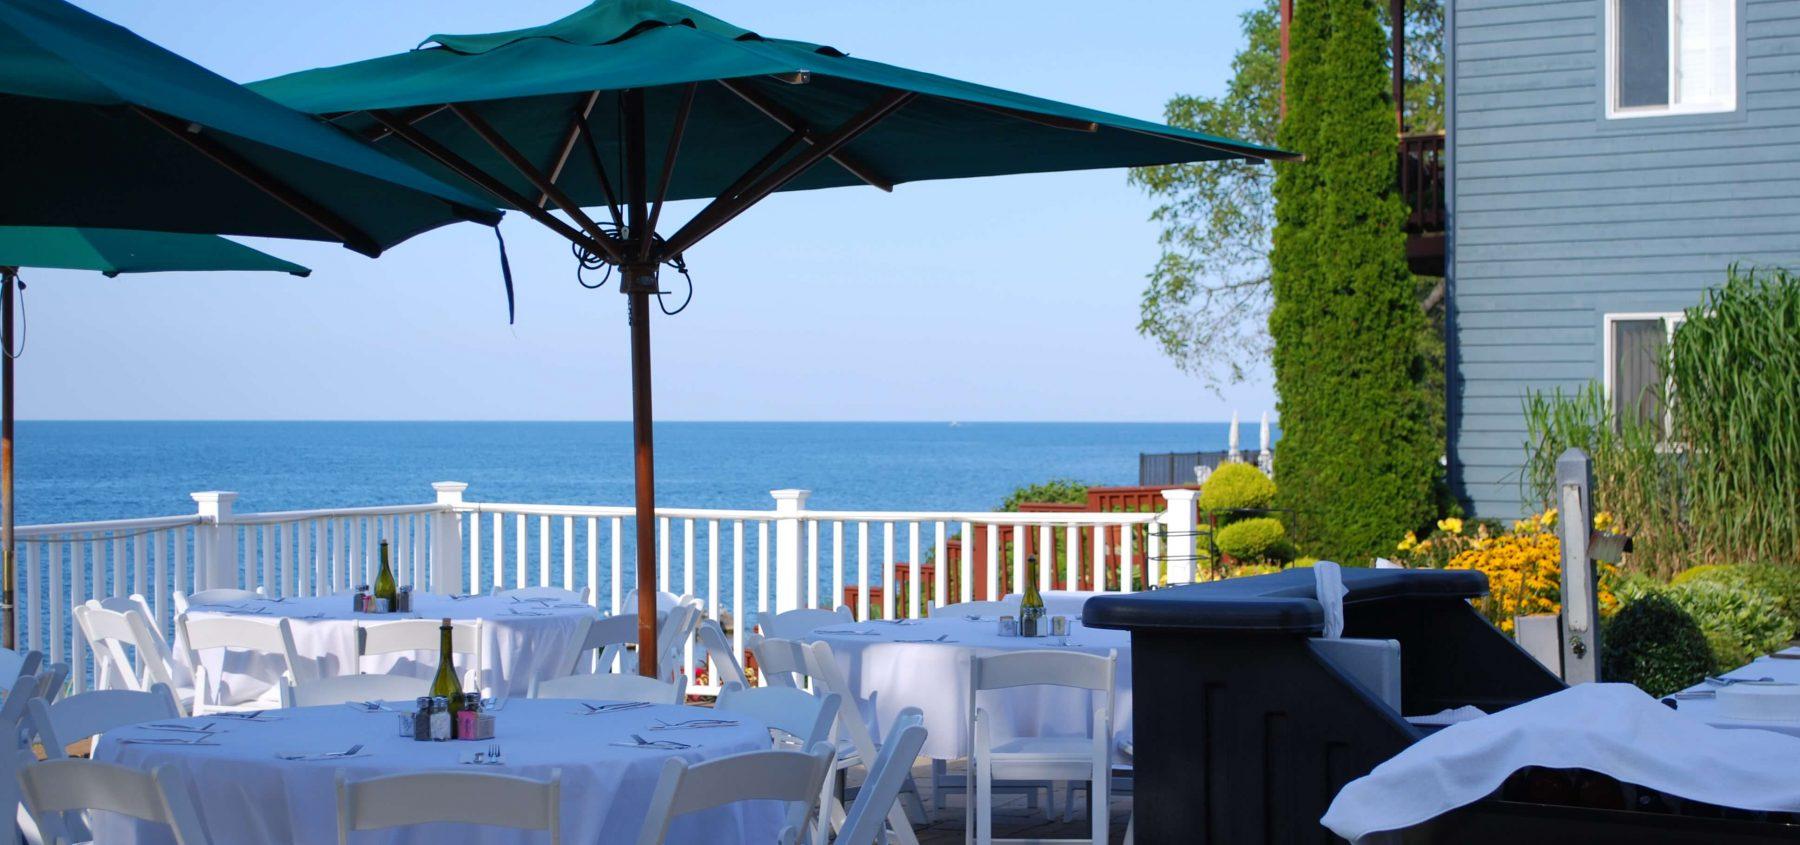 Lakefront Restaurant Geneva On The Lake Ohio